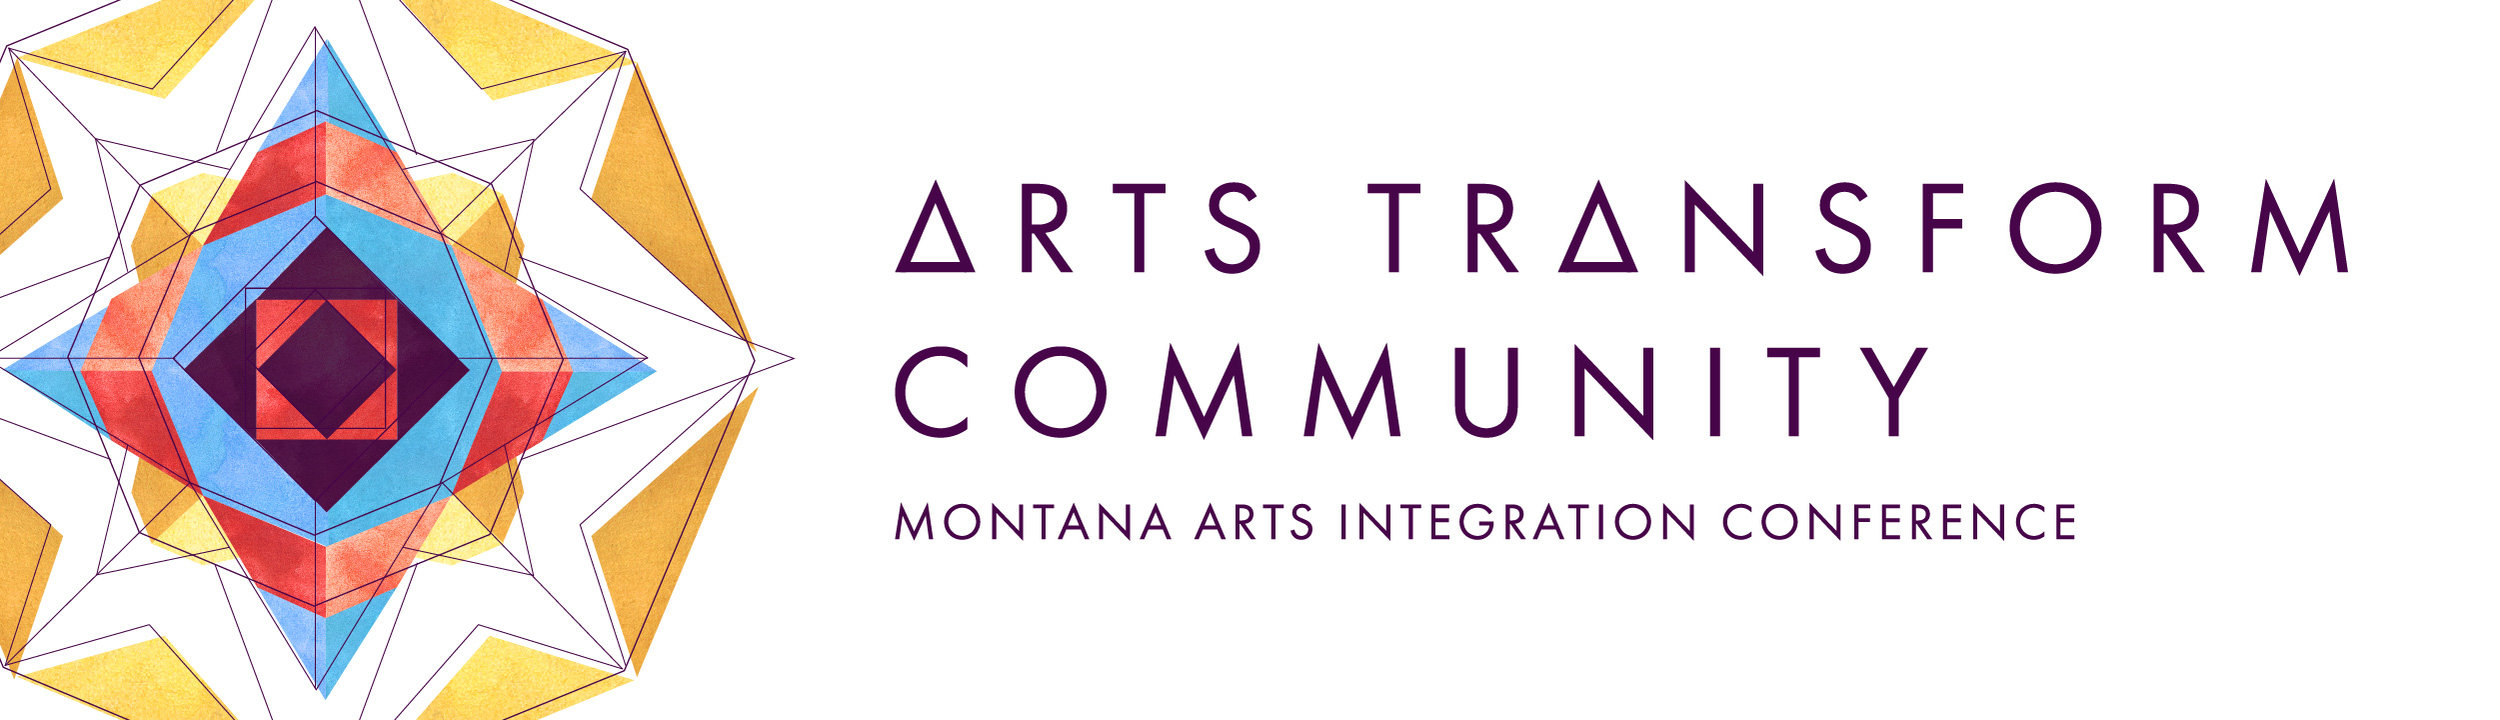 ArtsTransformCommunity_Logo-04.jpg